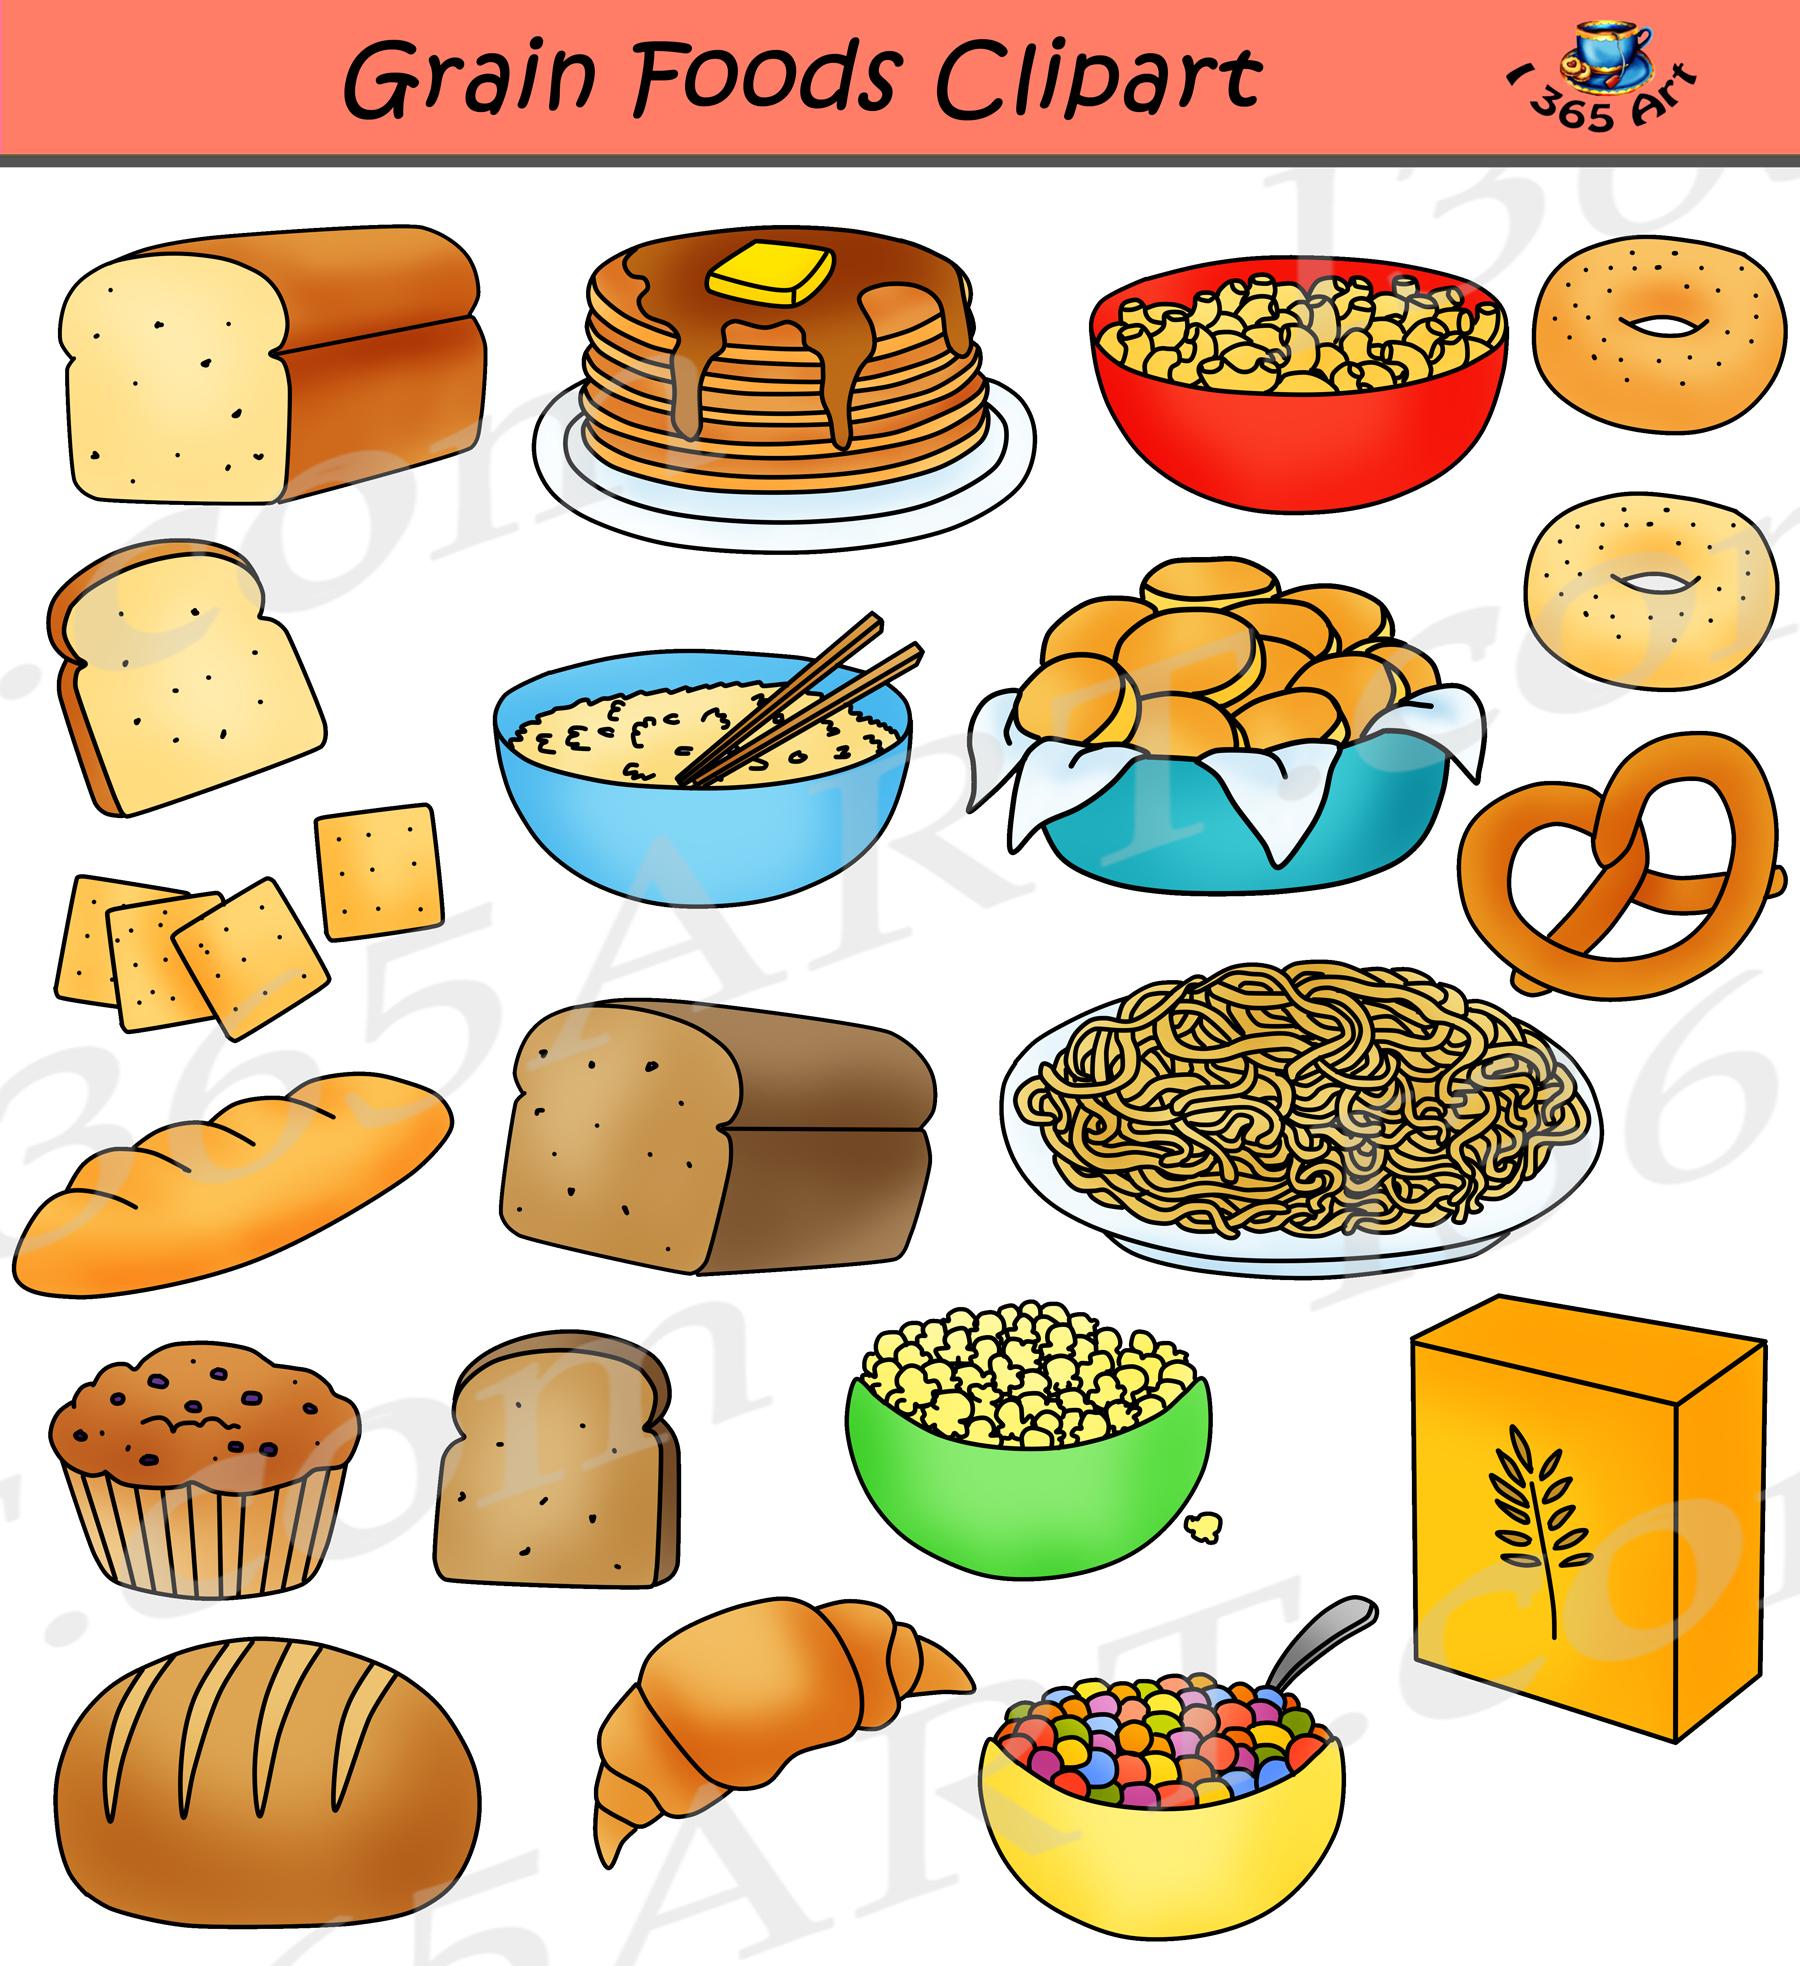 Grain clipart grain product. Grains breads food group